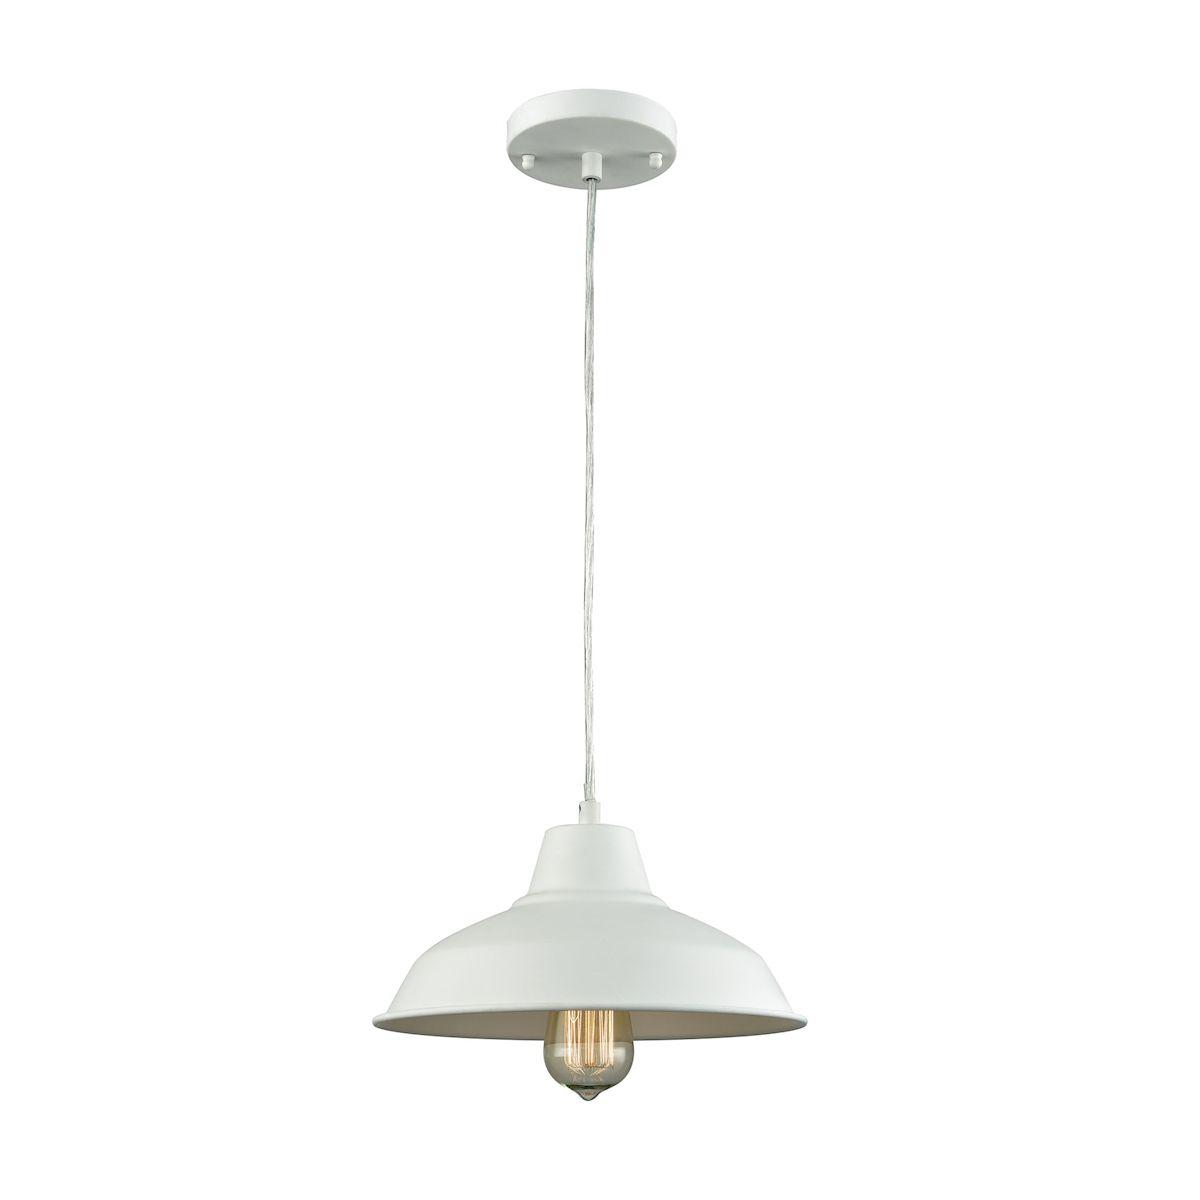 Thomas Lighting Cn770144 Clic Loft 1 Light Pendant In